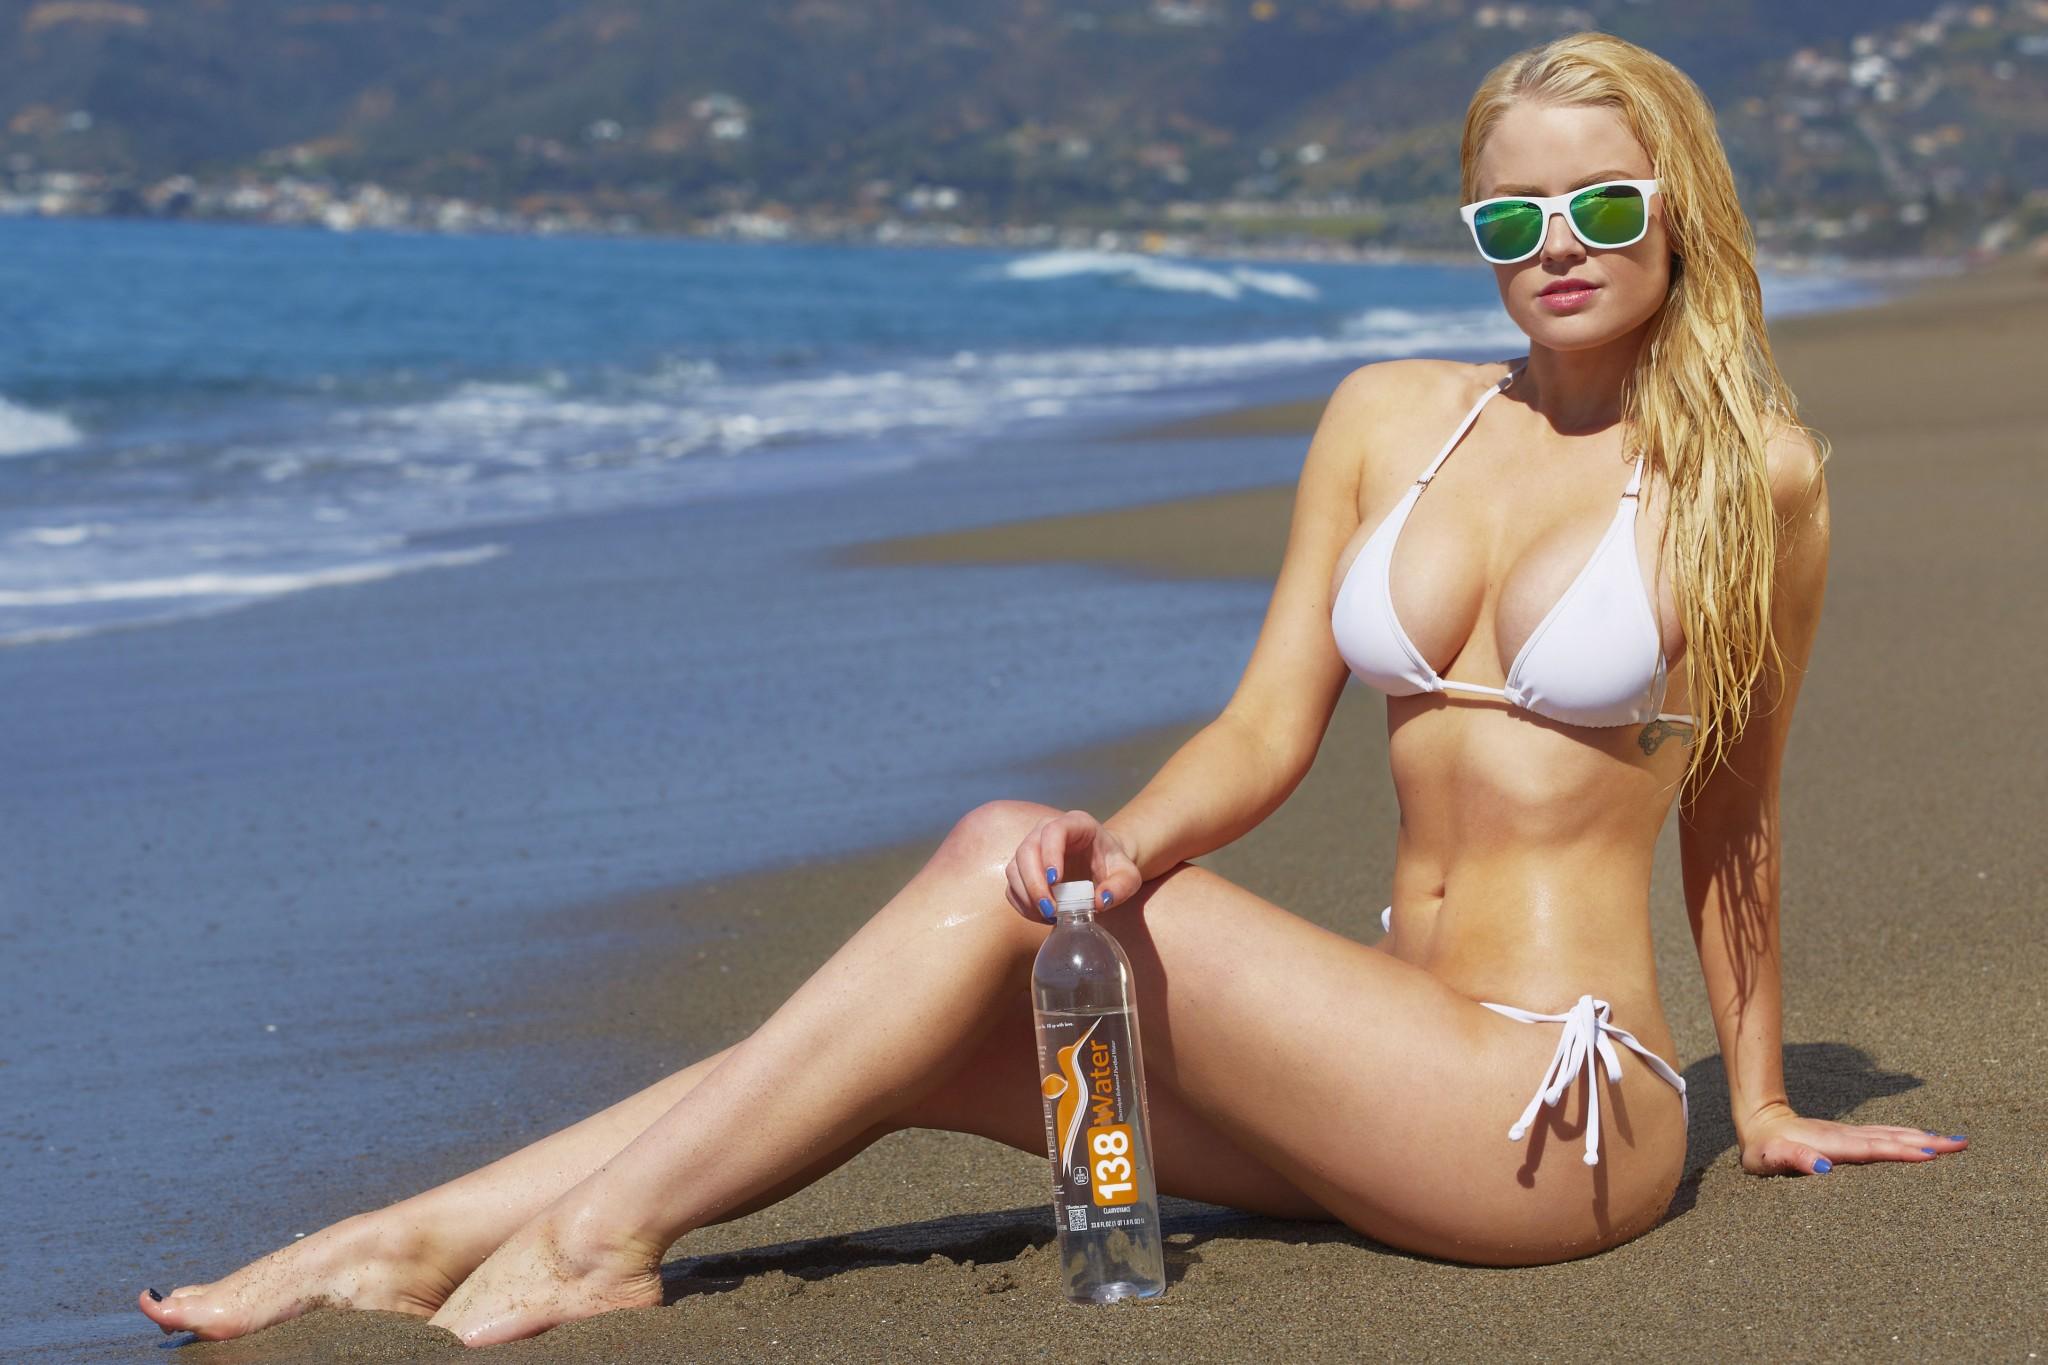 anna-sophia-berglund-bikini-photoshoot-9